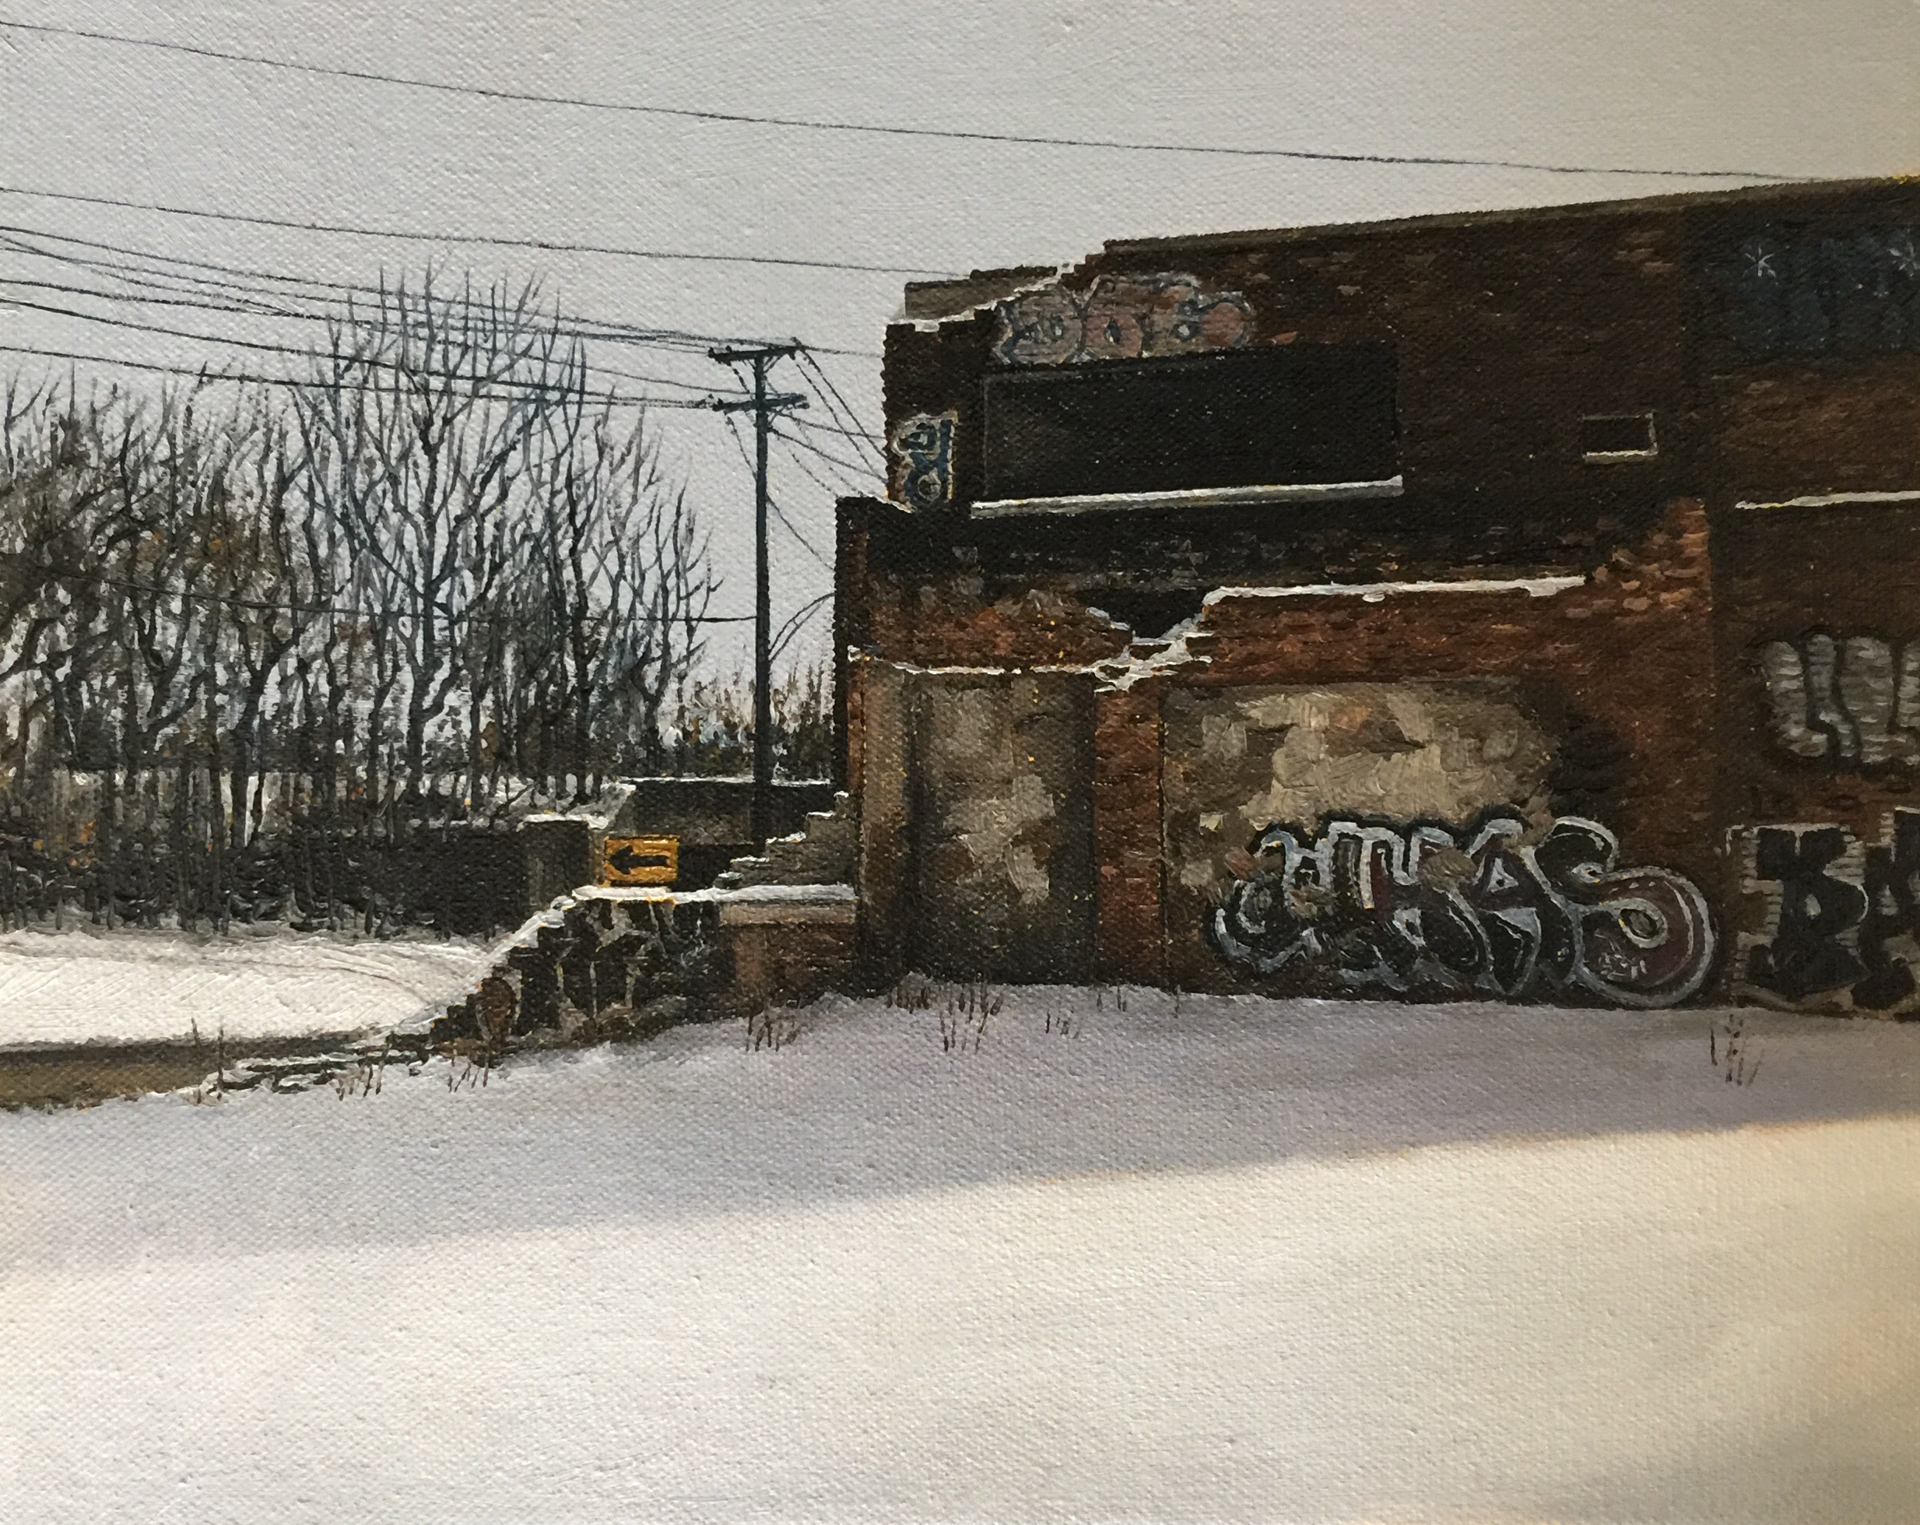 Central Street by Stephanie Buer